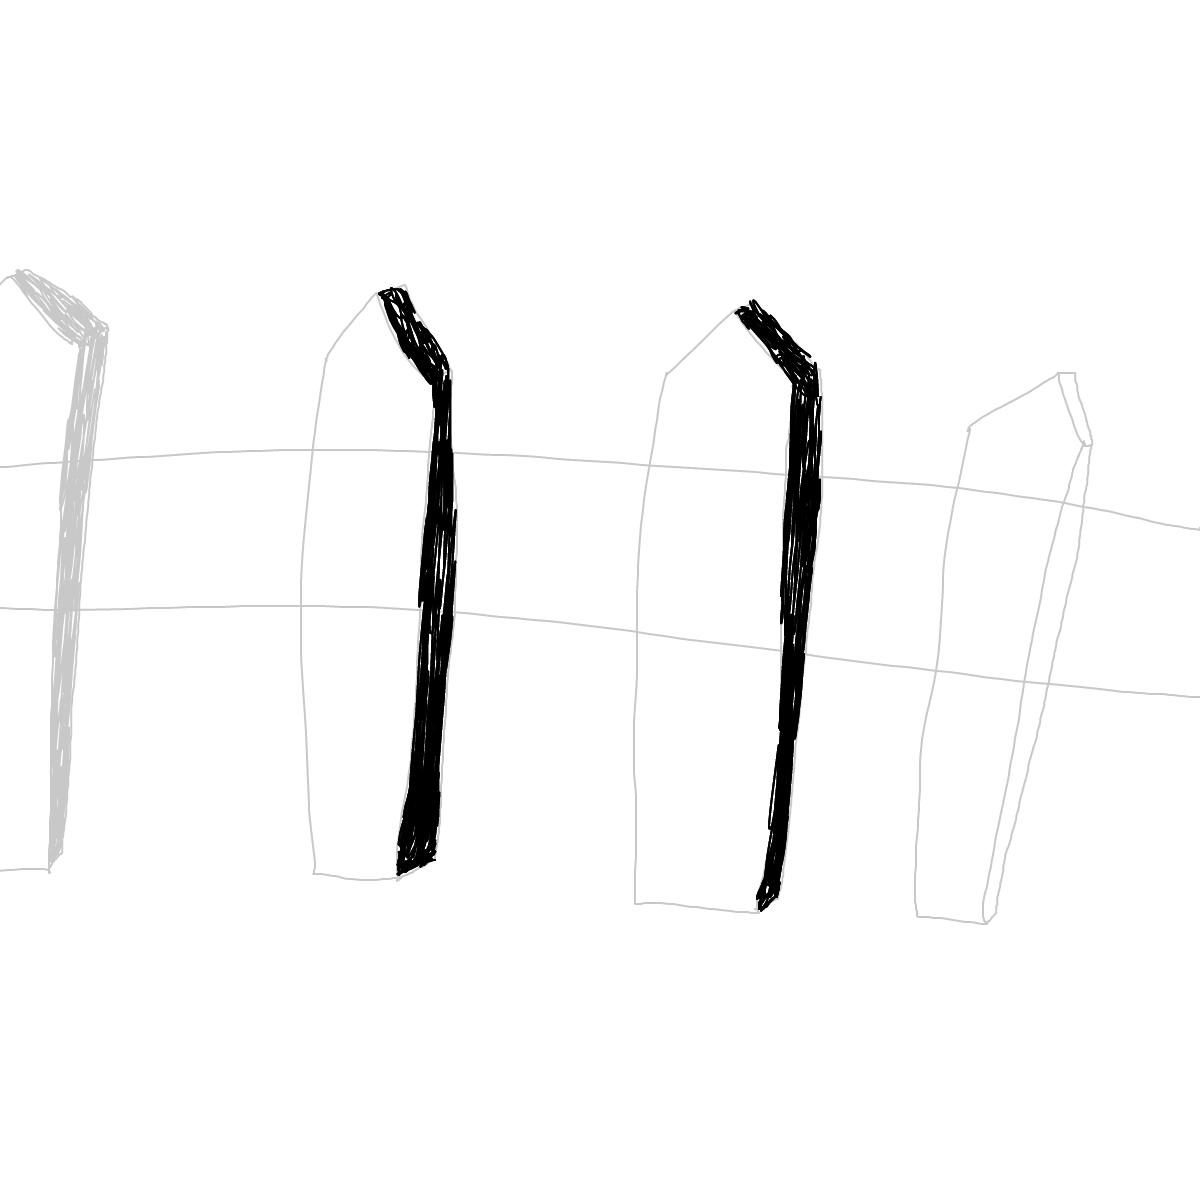 BAAAM drawing#9383 lat:52.4750480651855500lng: 13.4072952270507810